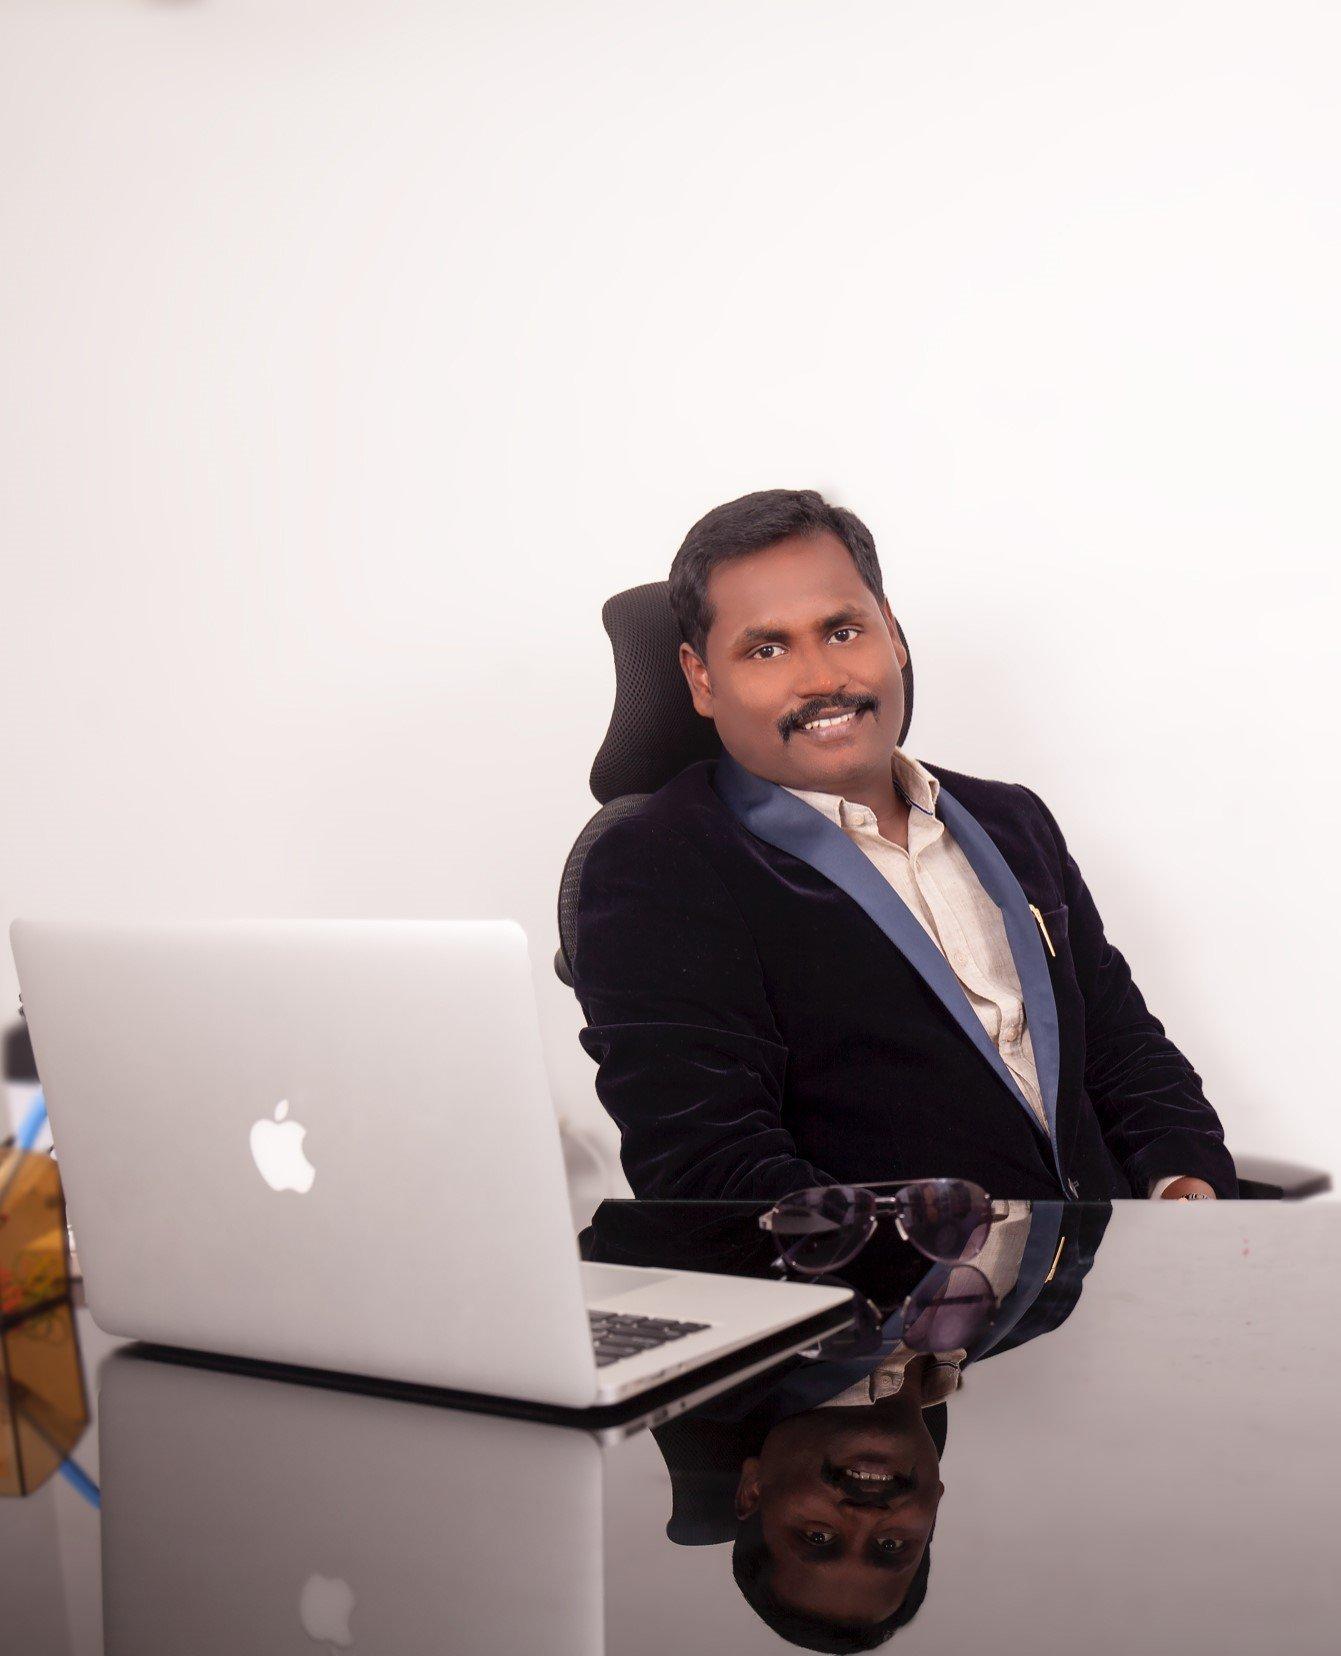 Gopalakrishnan - Founder of Best Educational Service in Tamilnadu - Toppersno1.com